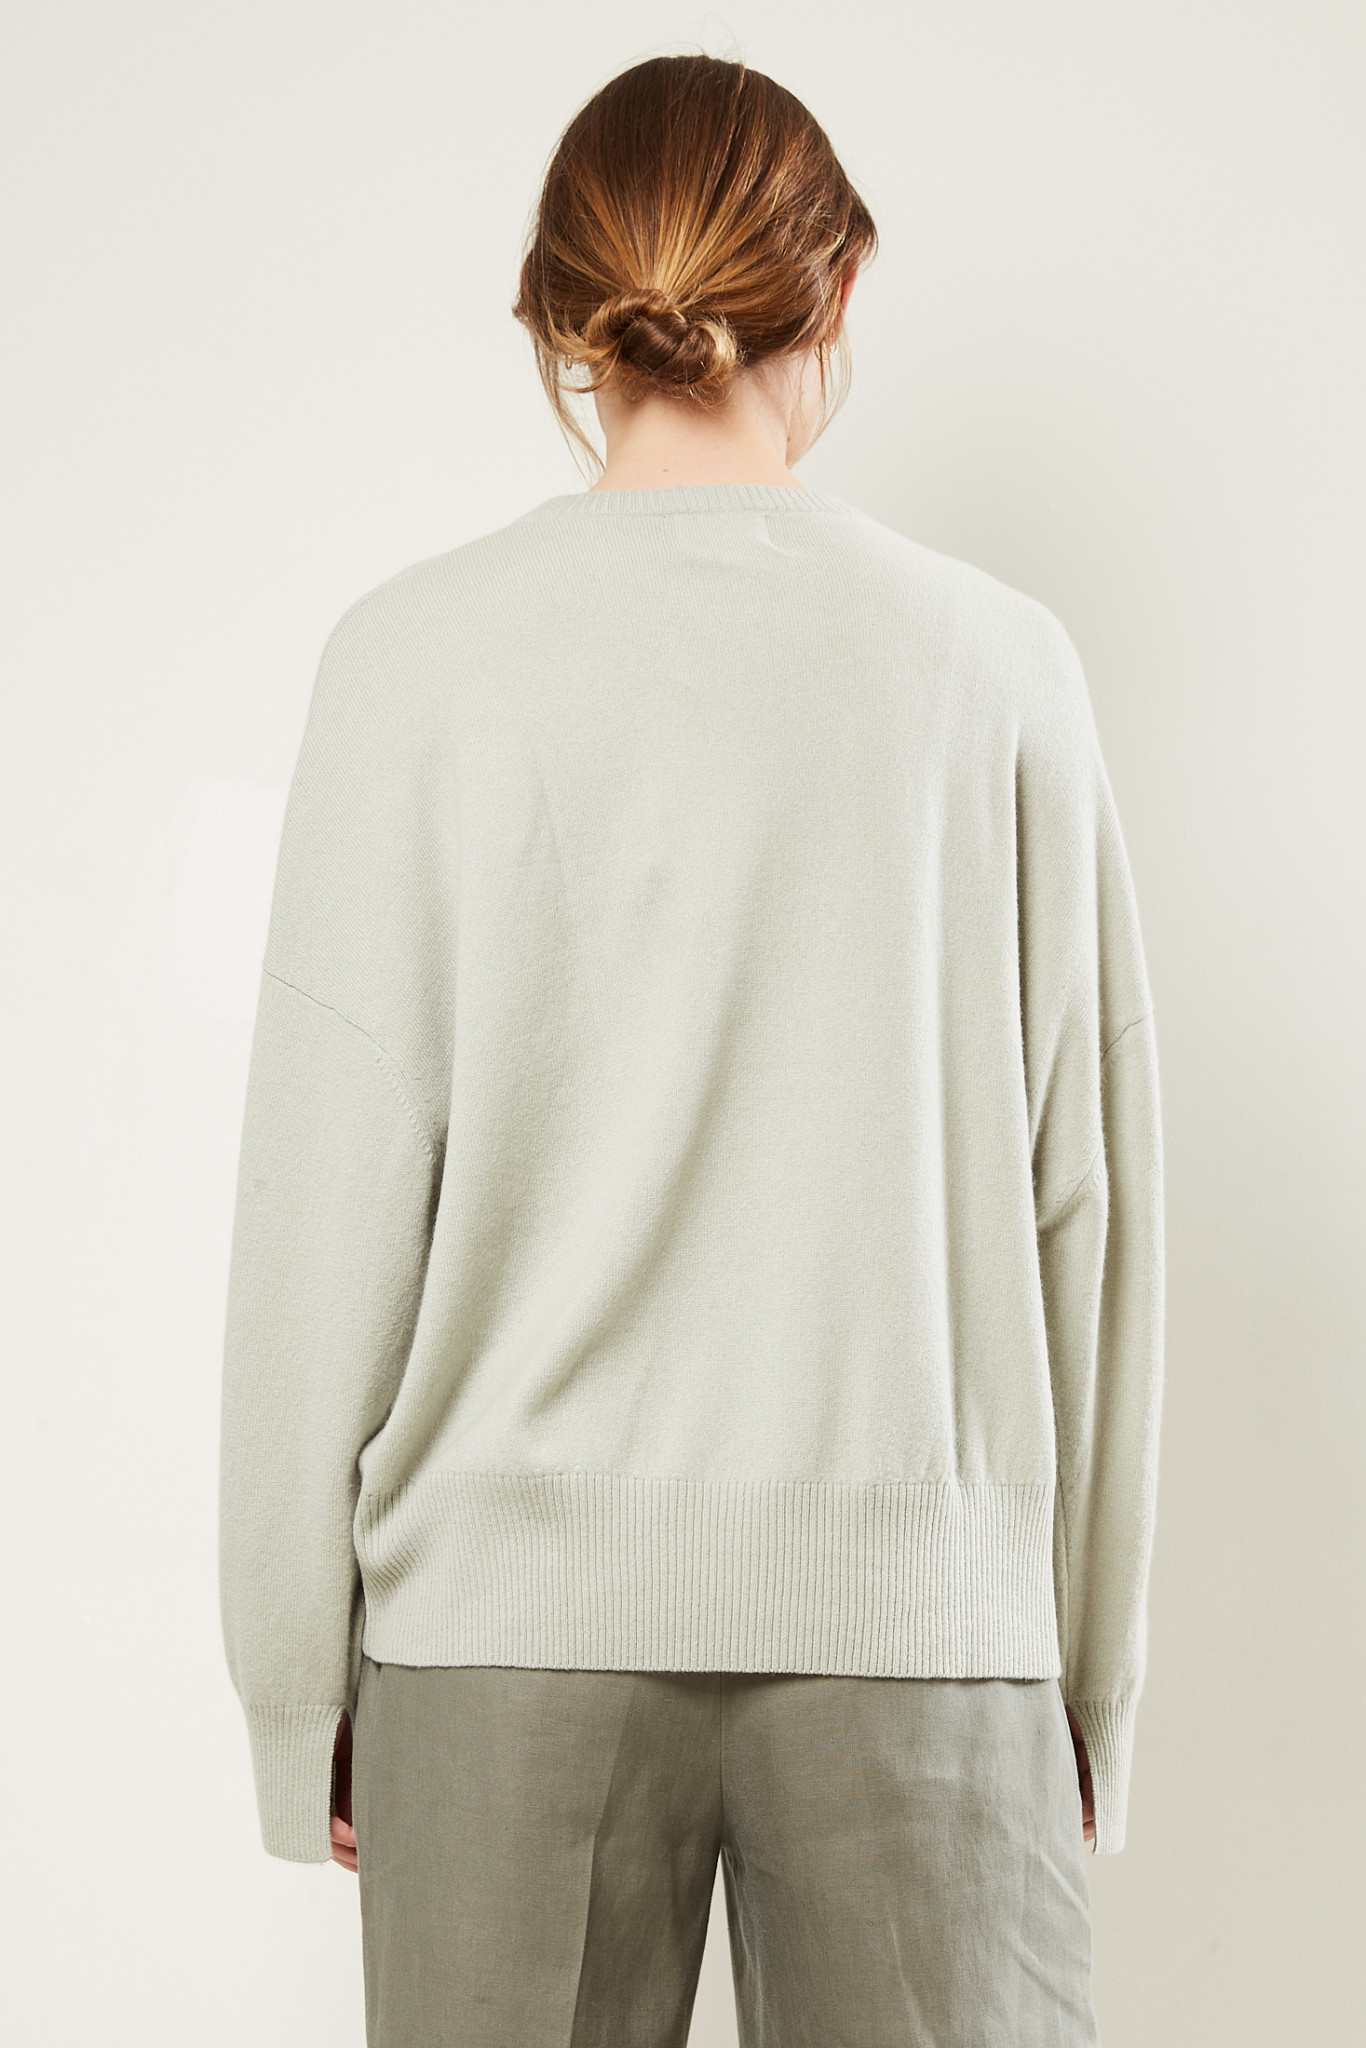 loulou studio - Anaa cashmere sweater